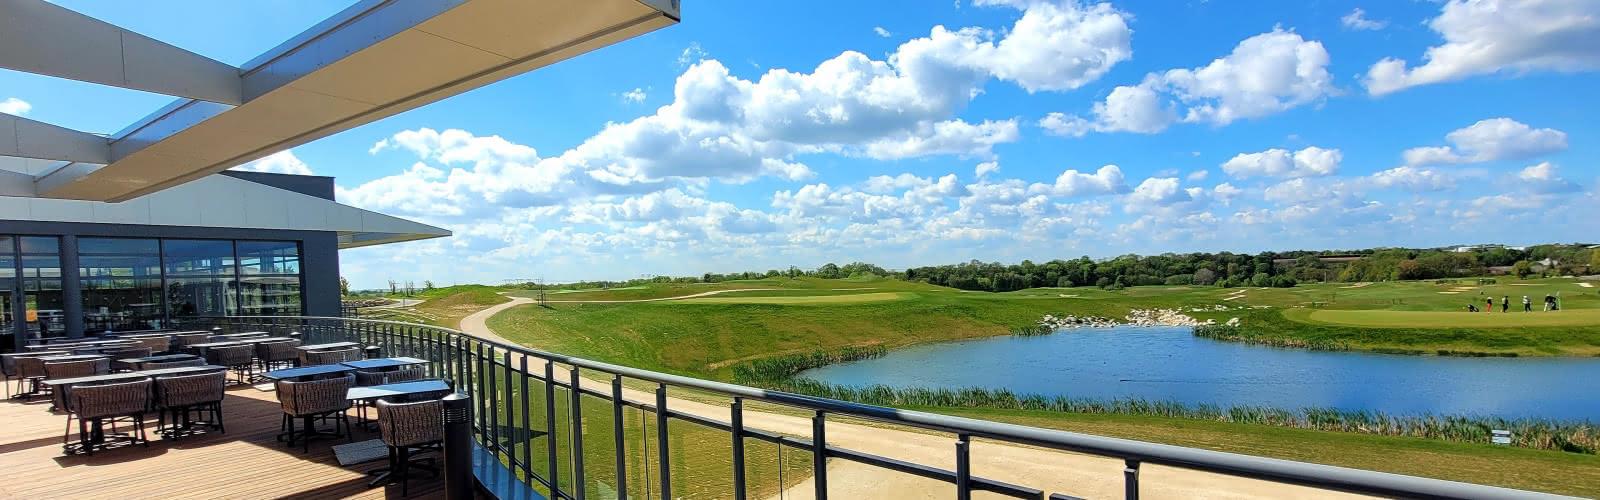 terrasse du restaurant du golf